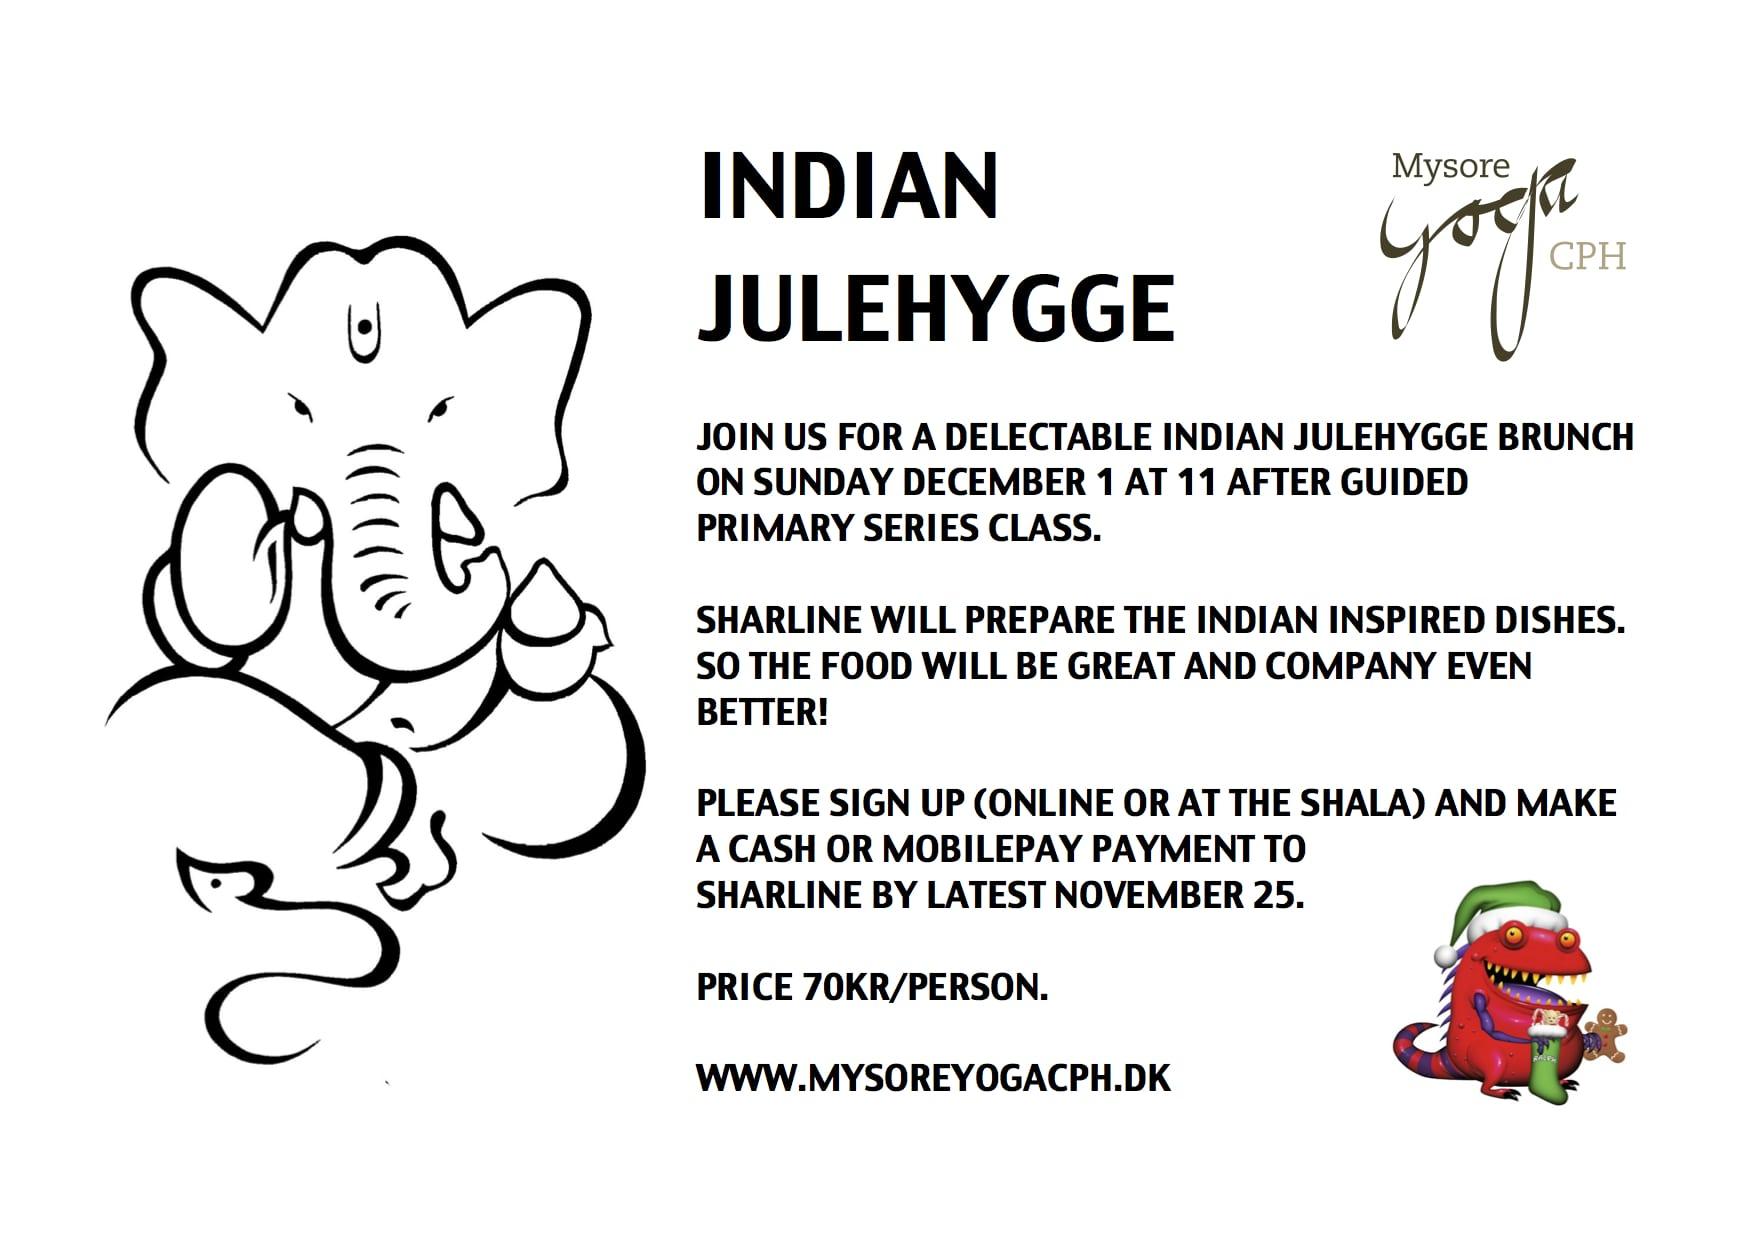 Indian Julehygge - Mysore Yoga CPH - Astanga yoga - Copenhagen - København